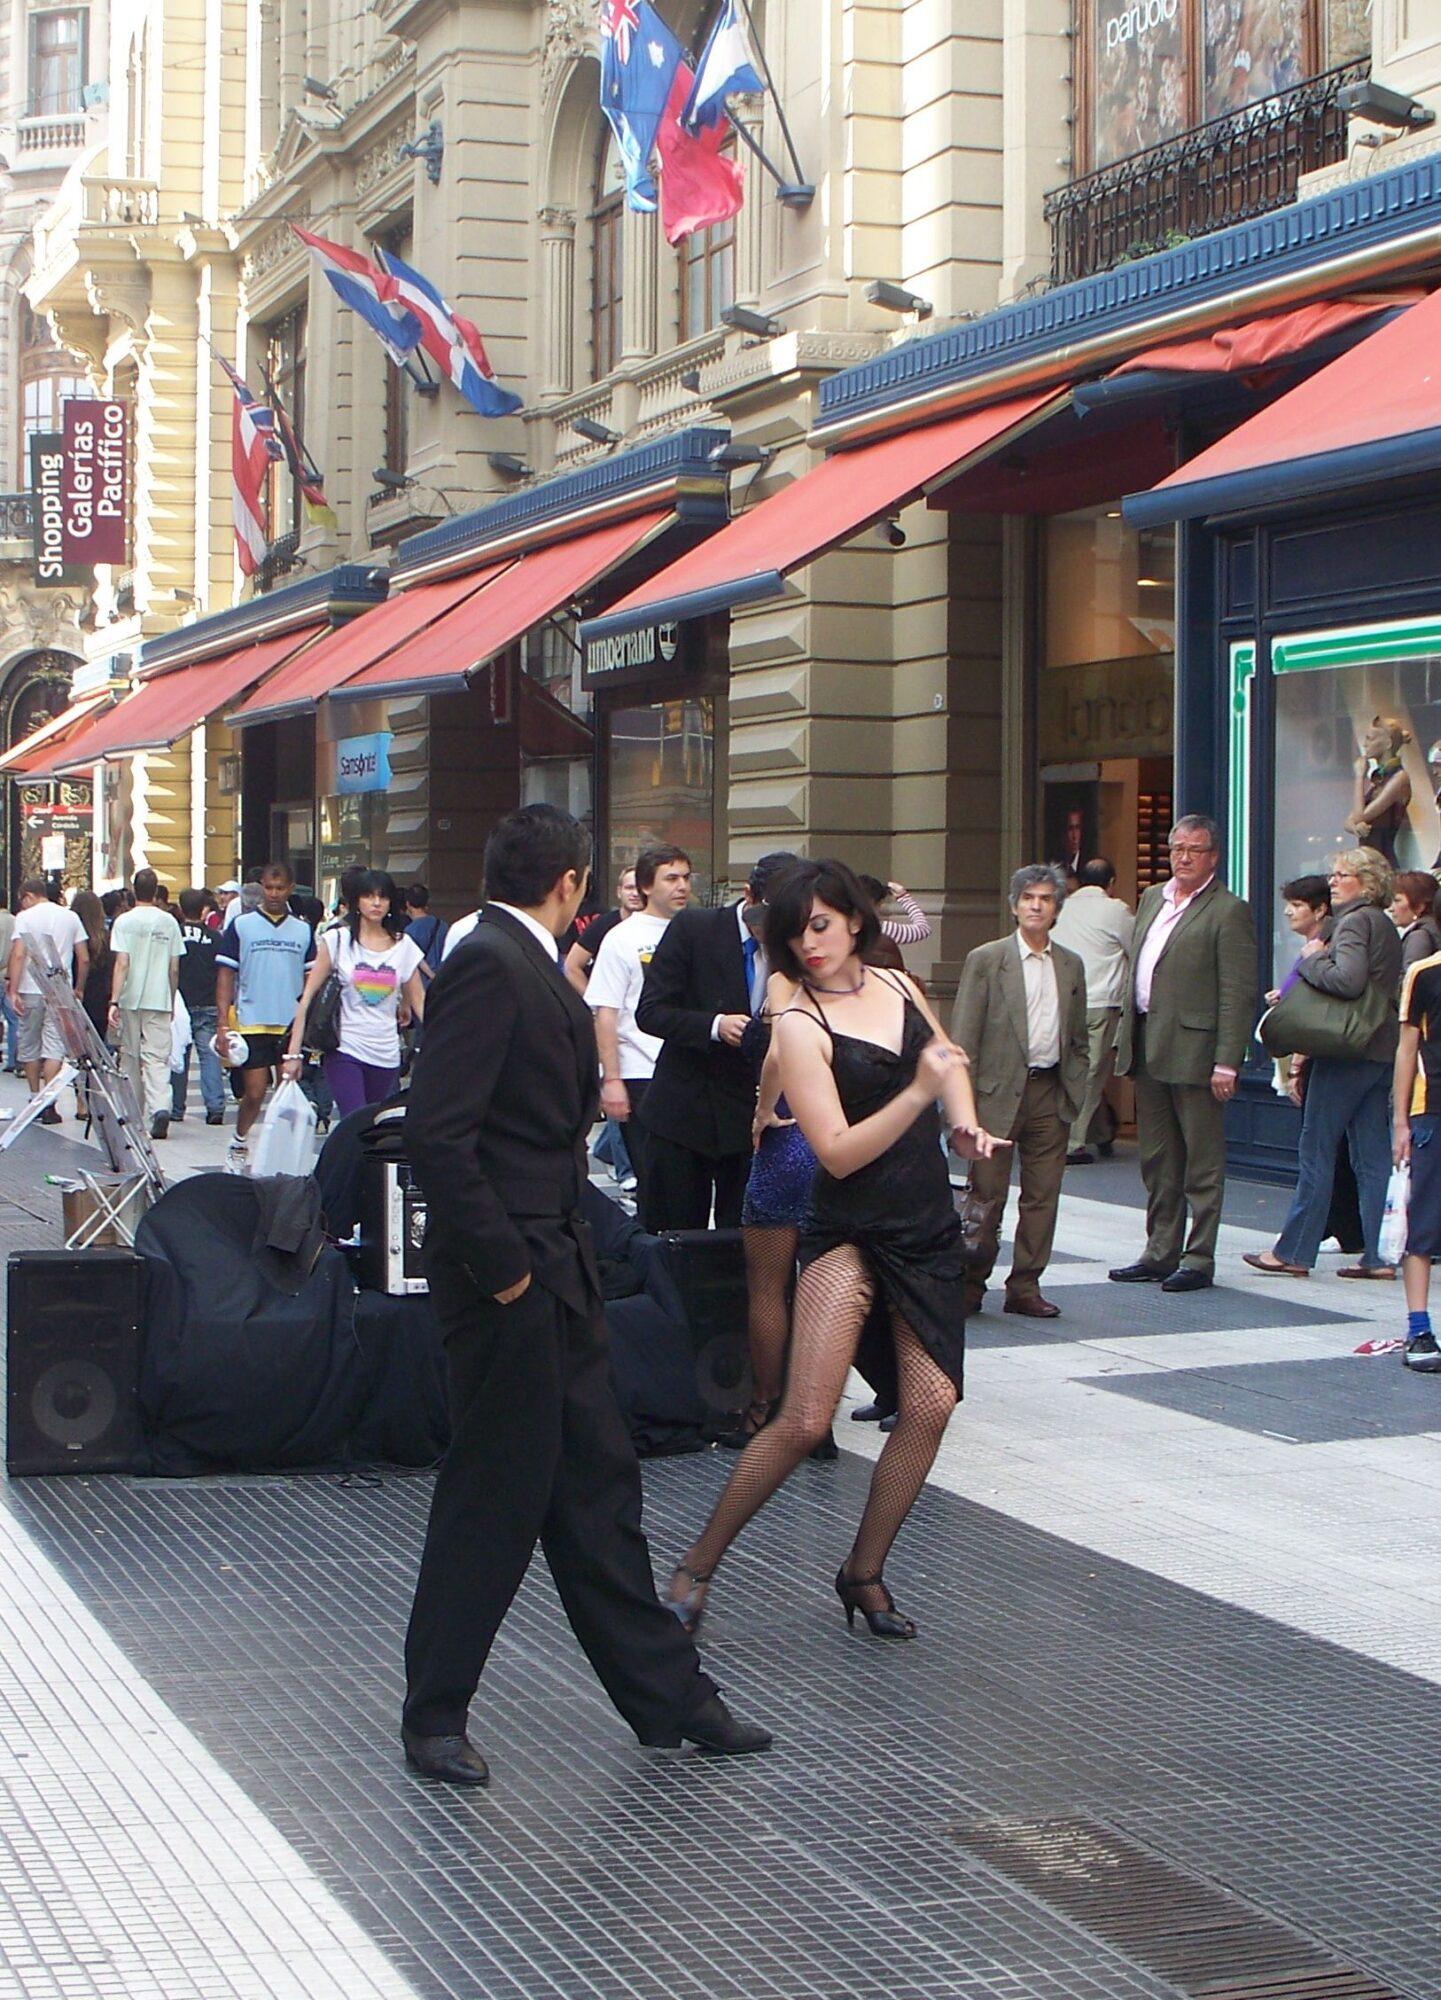 Buenos aires crisi commercio negozi calle florida pandemia